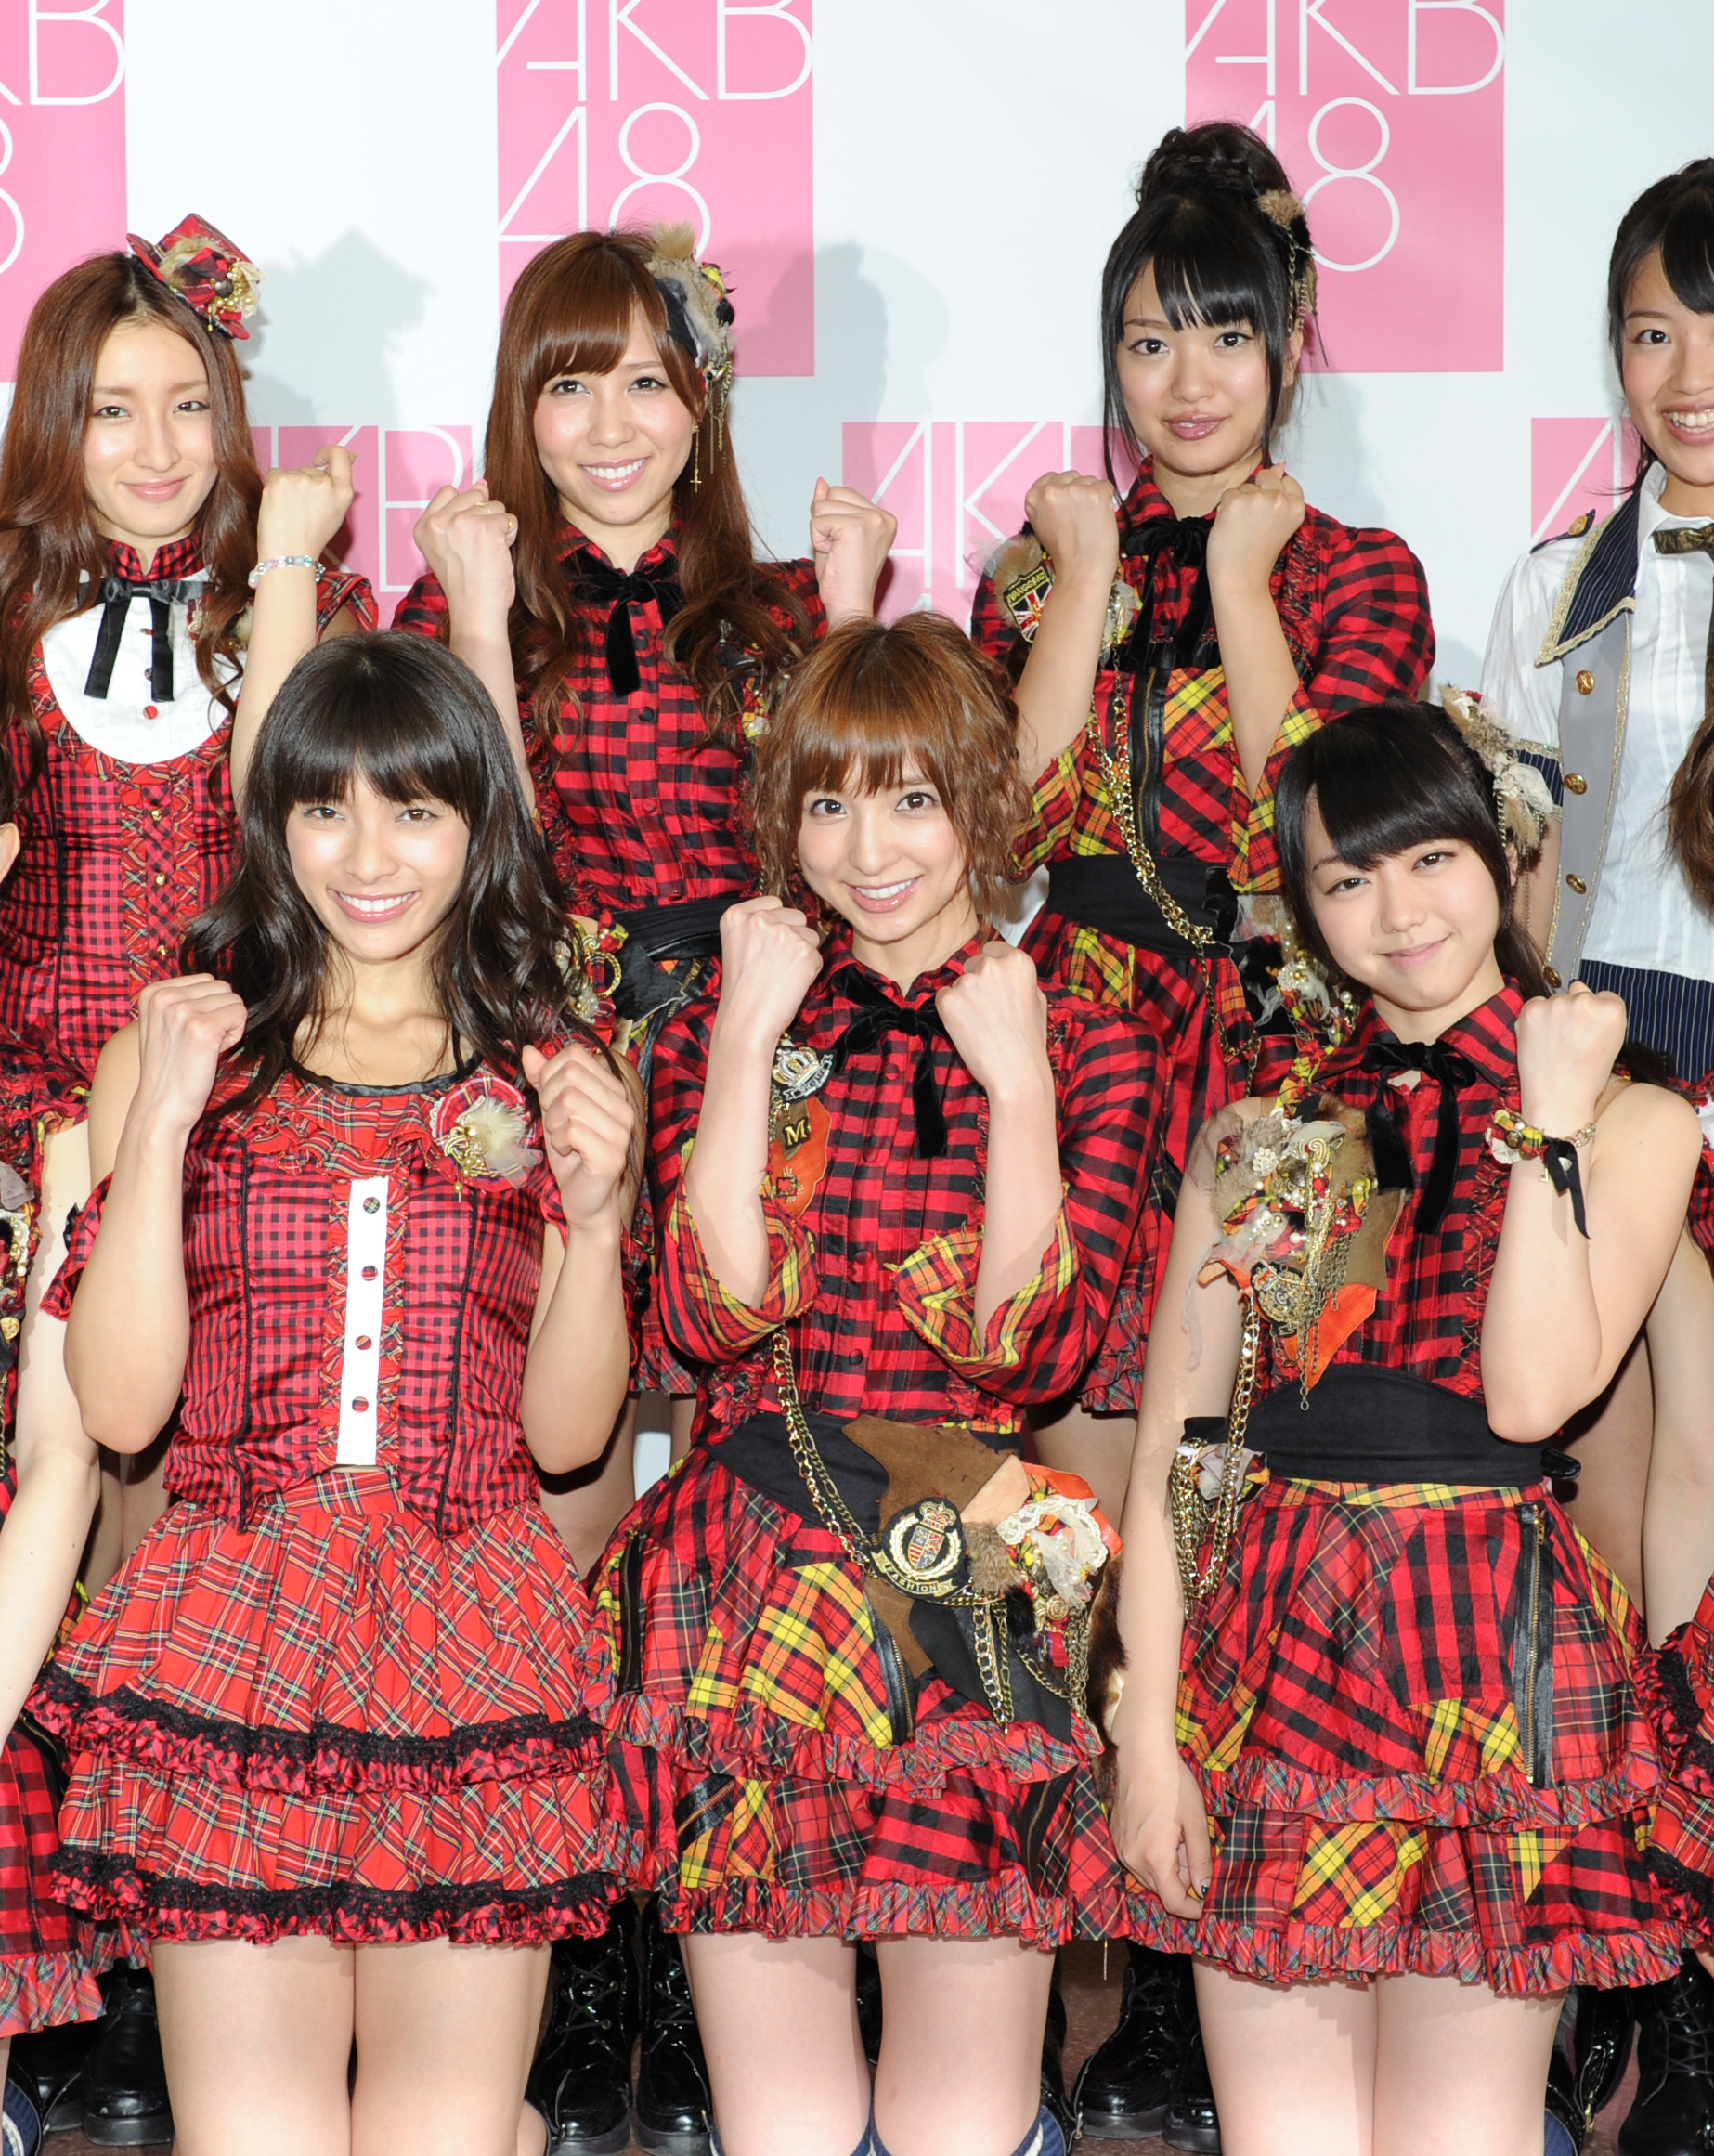 AKB48とKARA、空気が読める人はカラオケ1曲目にどちらを選ぶ?